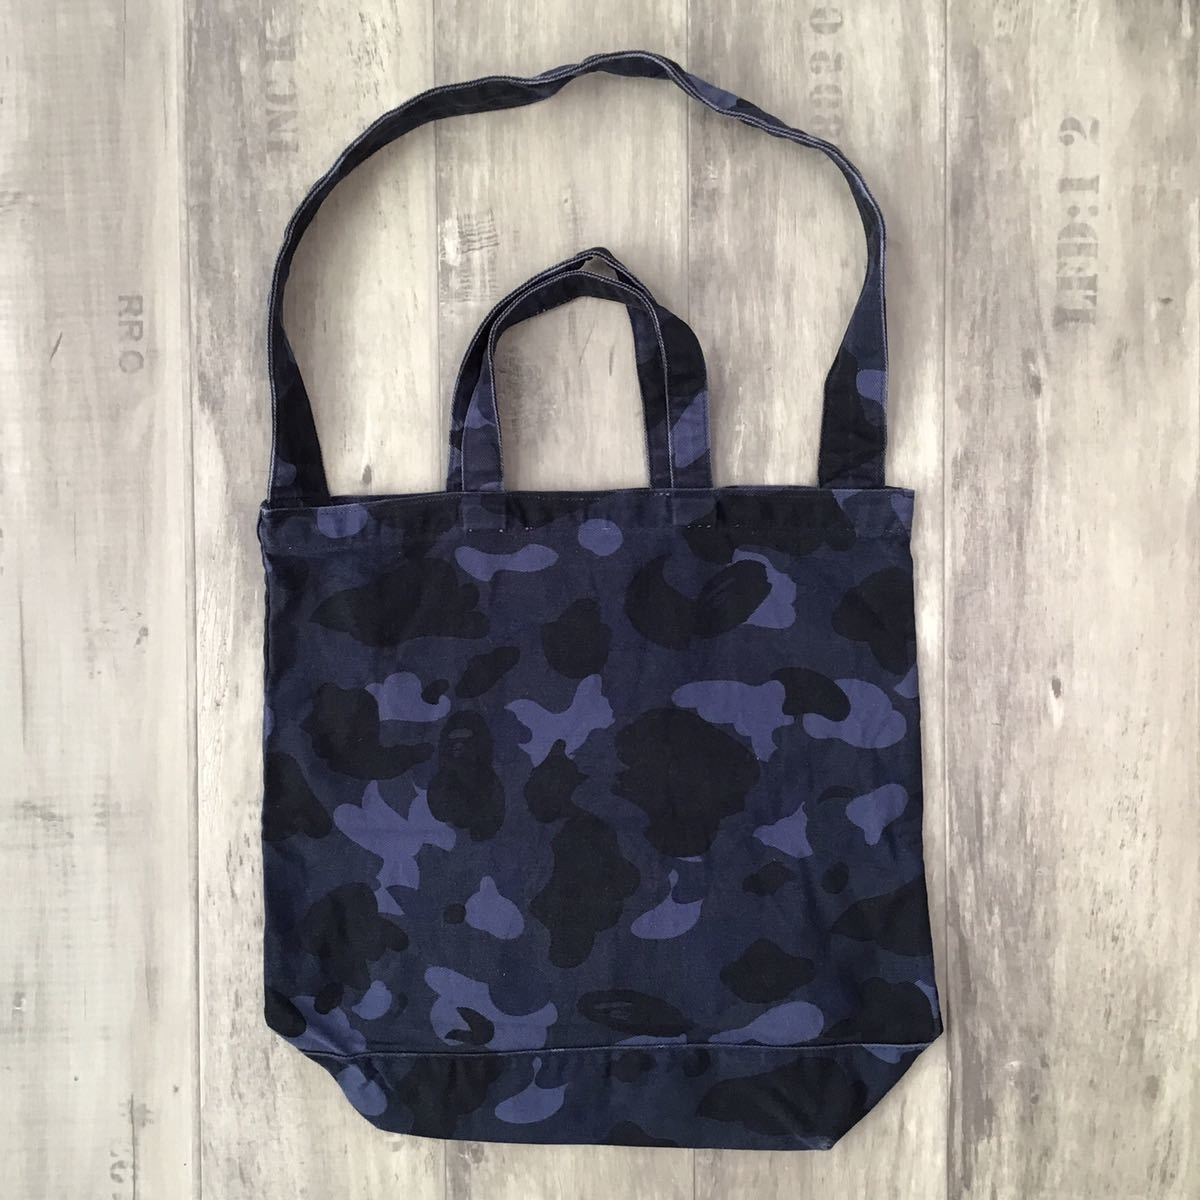 blue camo 2way トートバッグ a bathing ape bape tote bag エイプ ベイプ アベイシングエイプ 迷彩 バッグ ブルーカモ